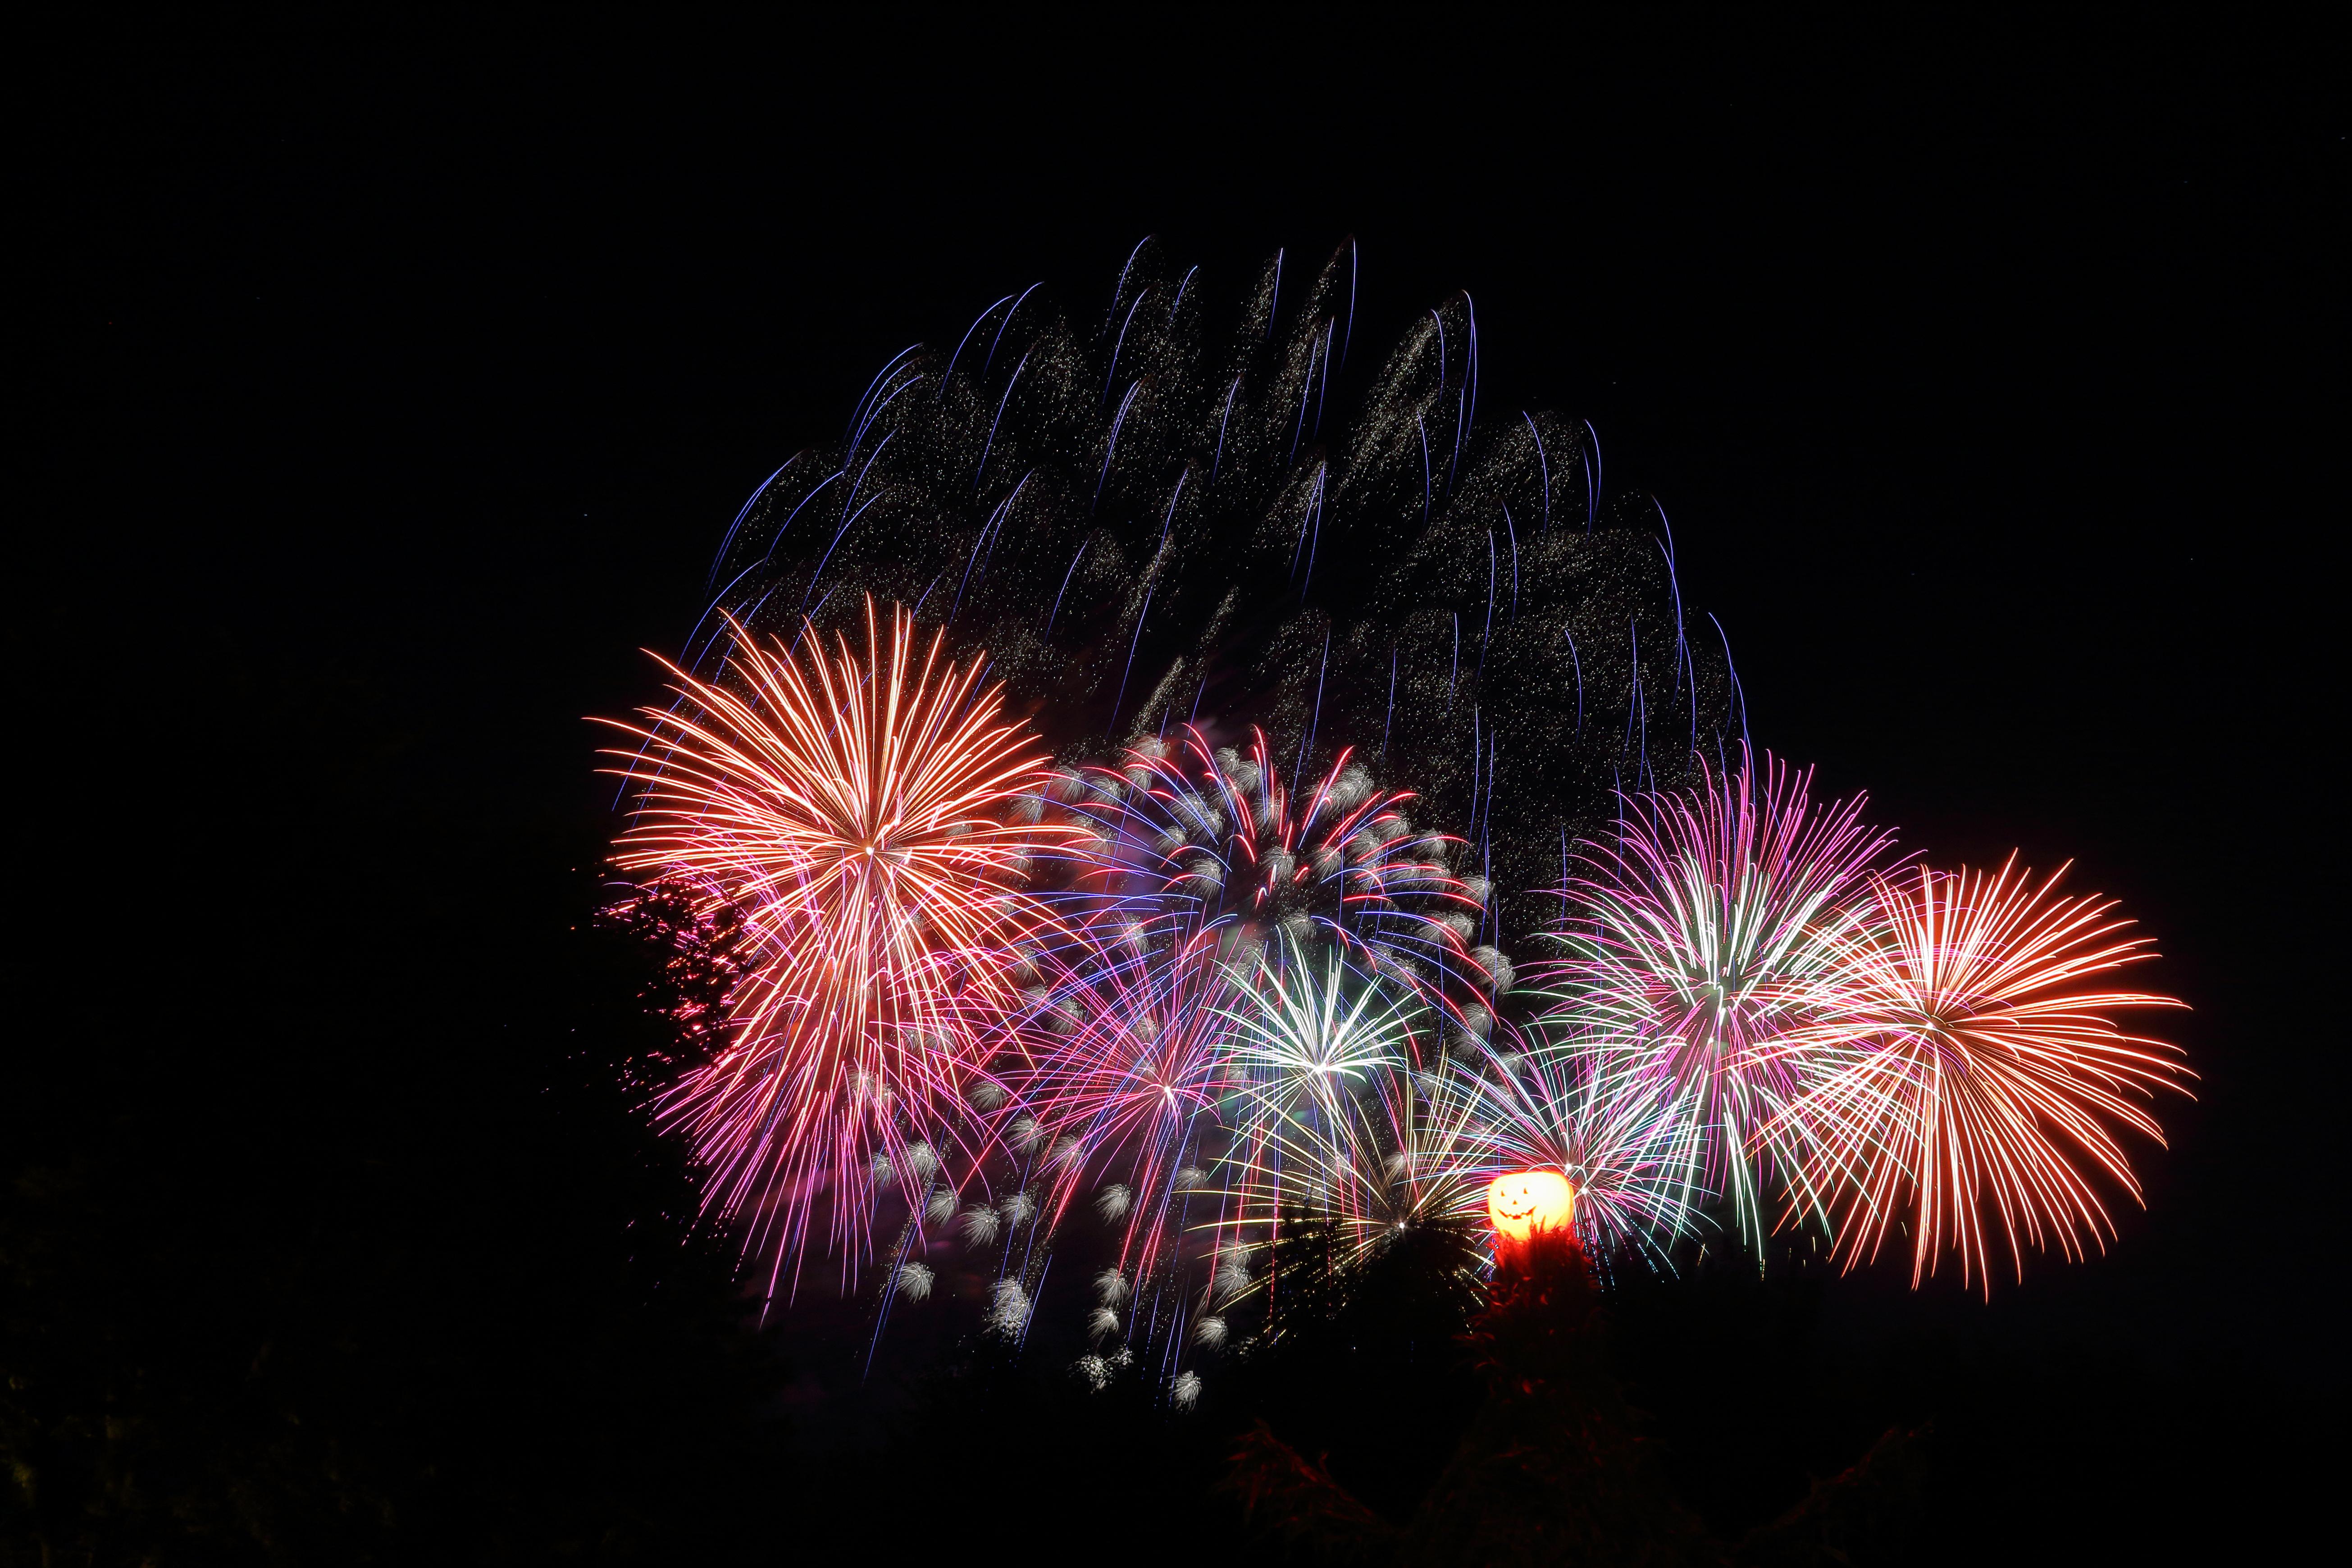 2018-09-21 - Vala's Pumpkin Patch Fireworks by WxKnowltey